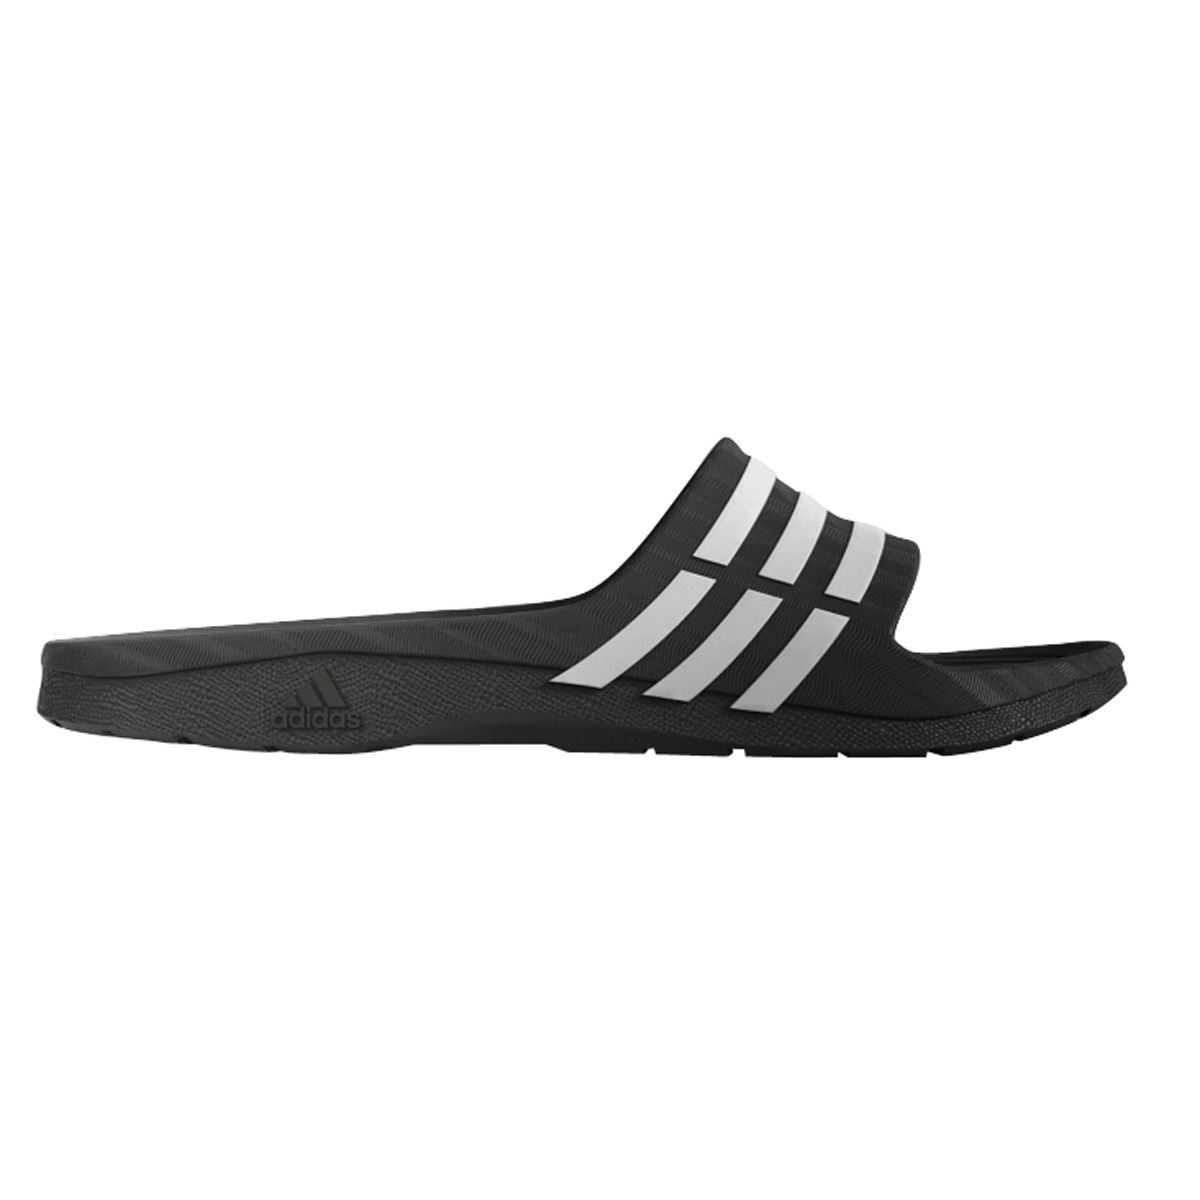 reputable site 16a98 237af Sandalias de natación de mujer Duramo Adidas